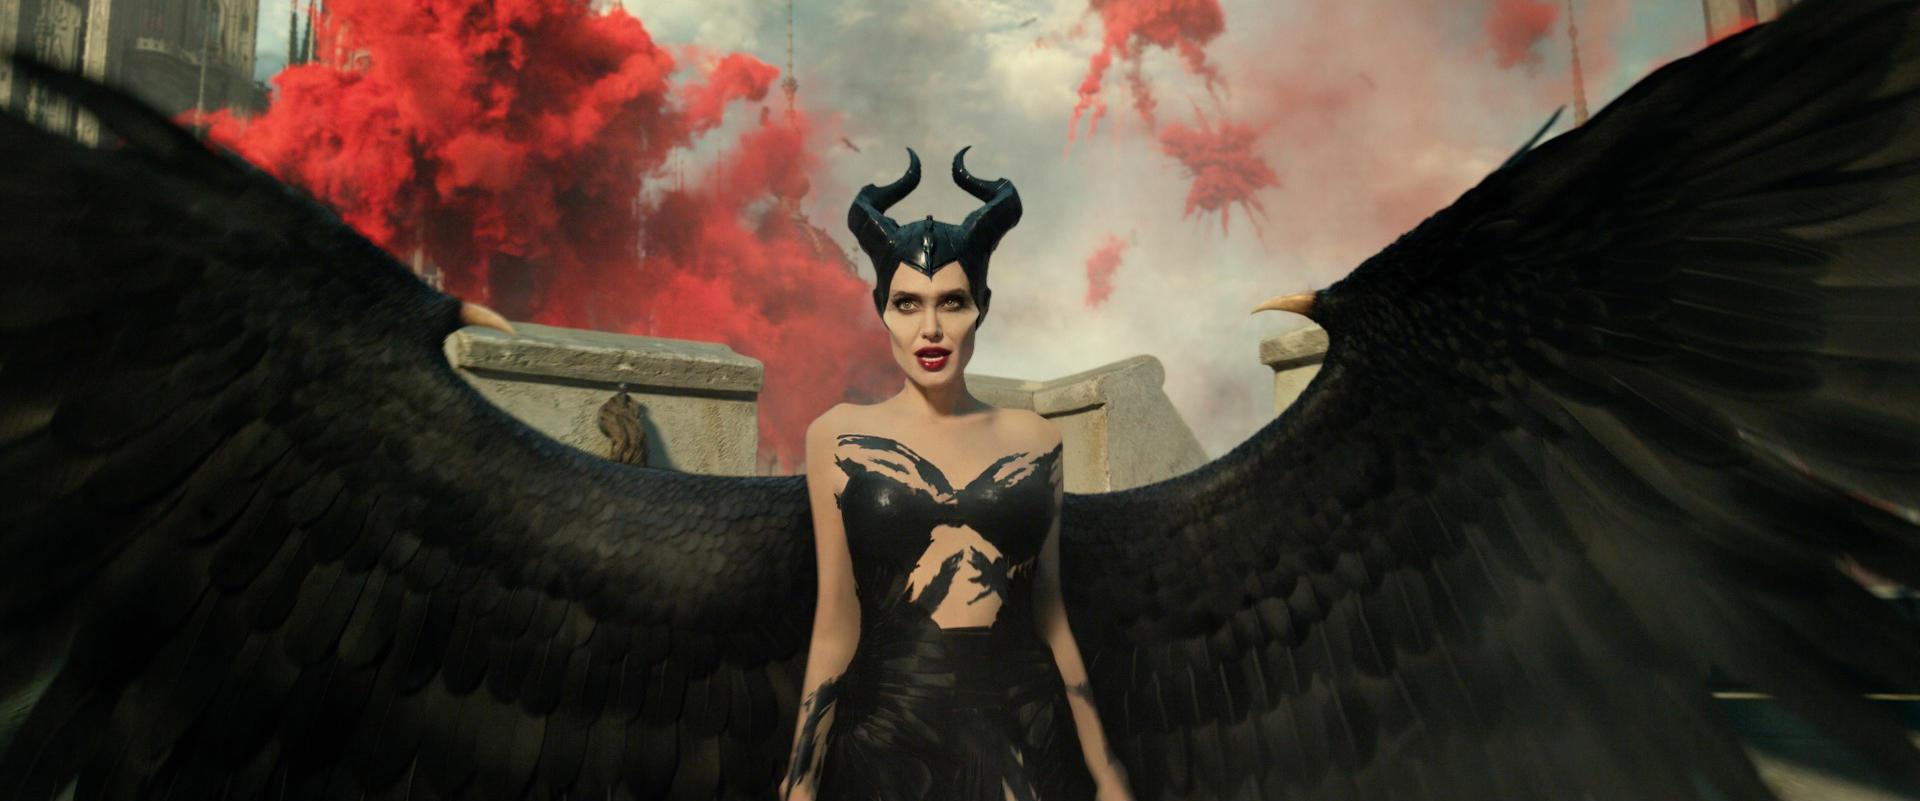 Image result for mistress of evil maleficent